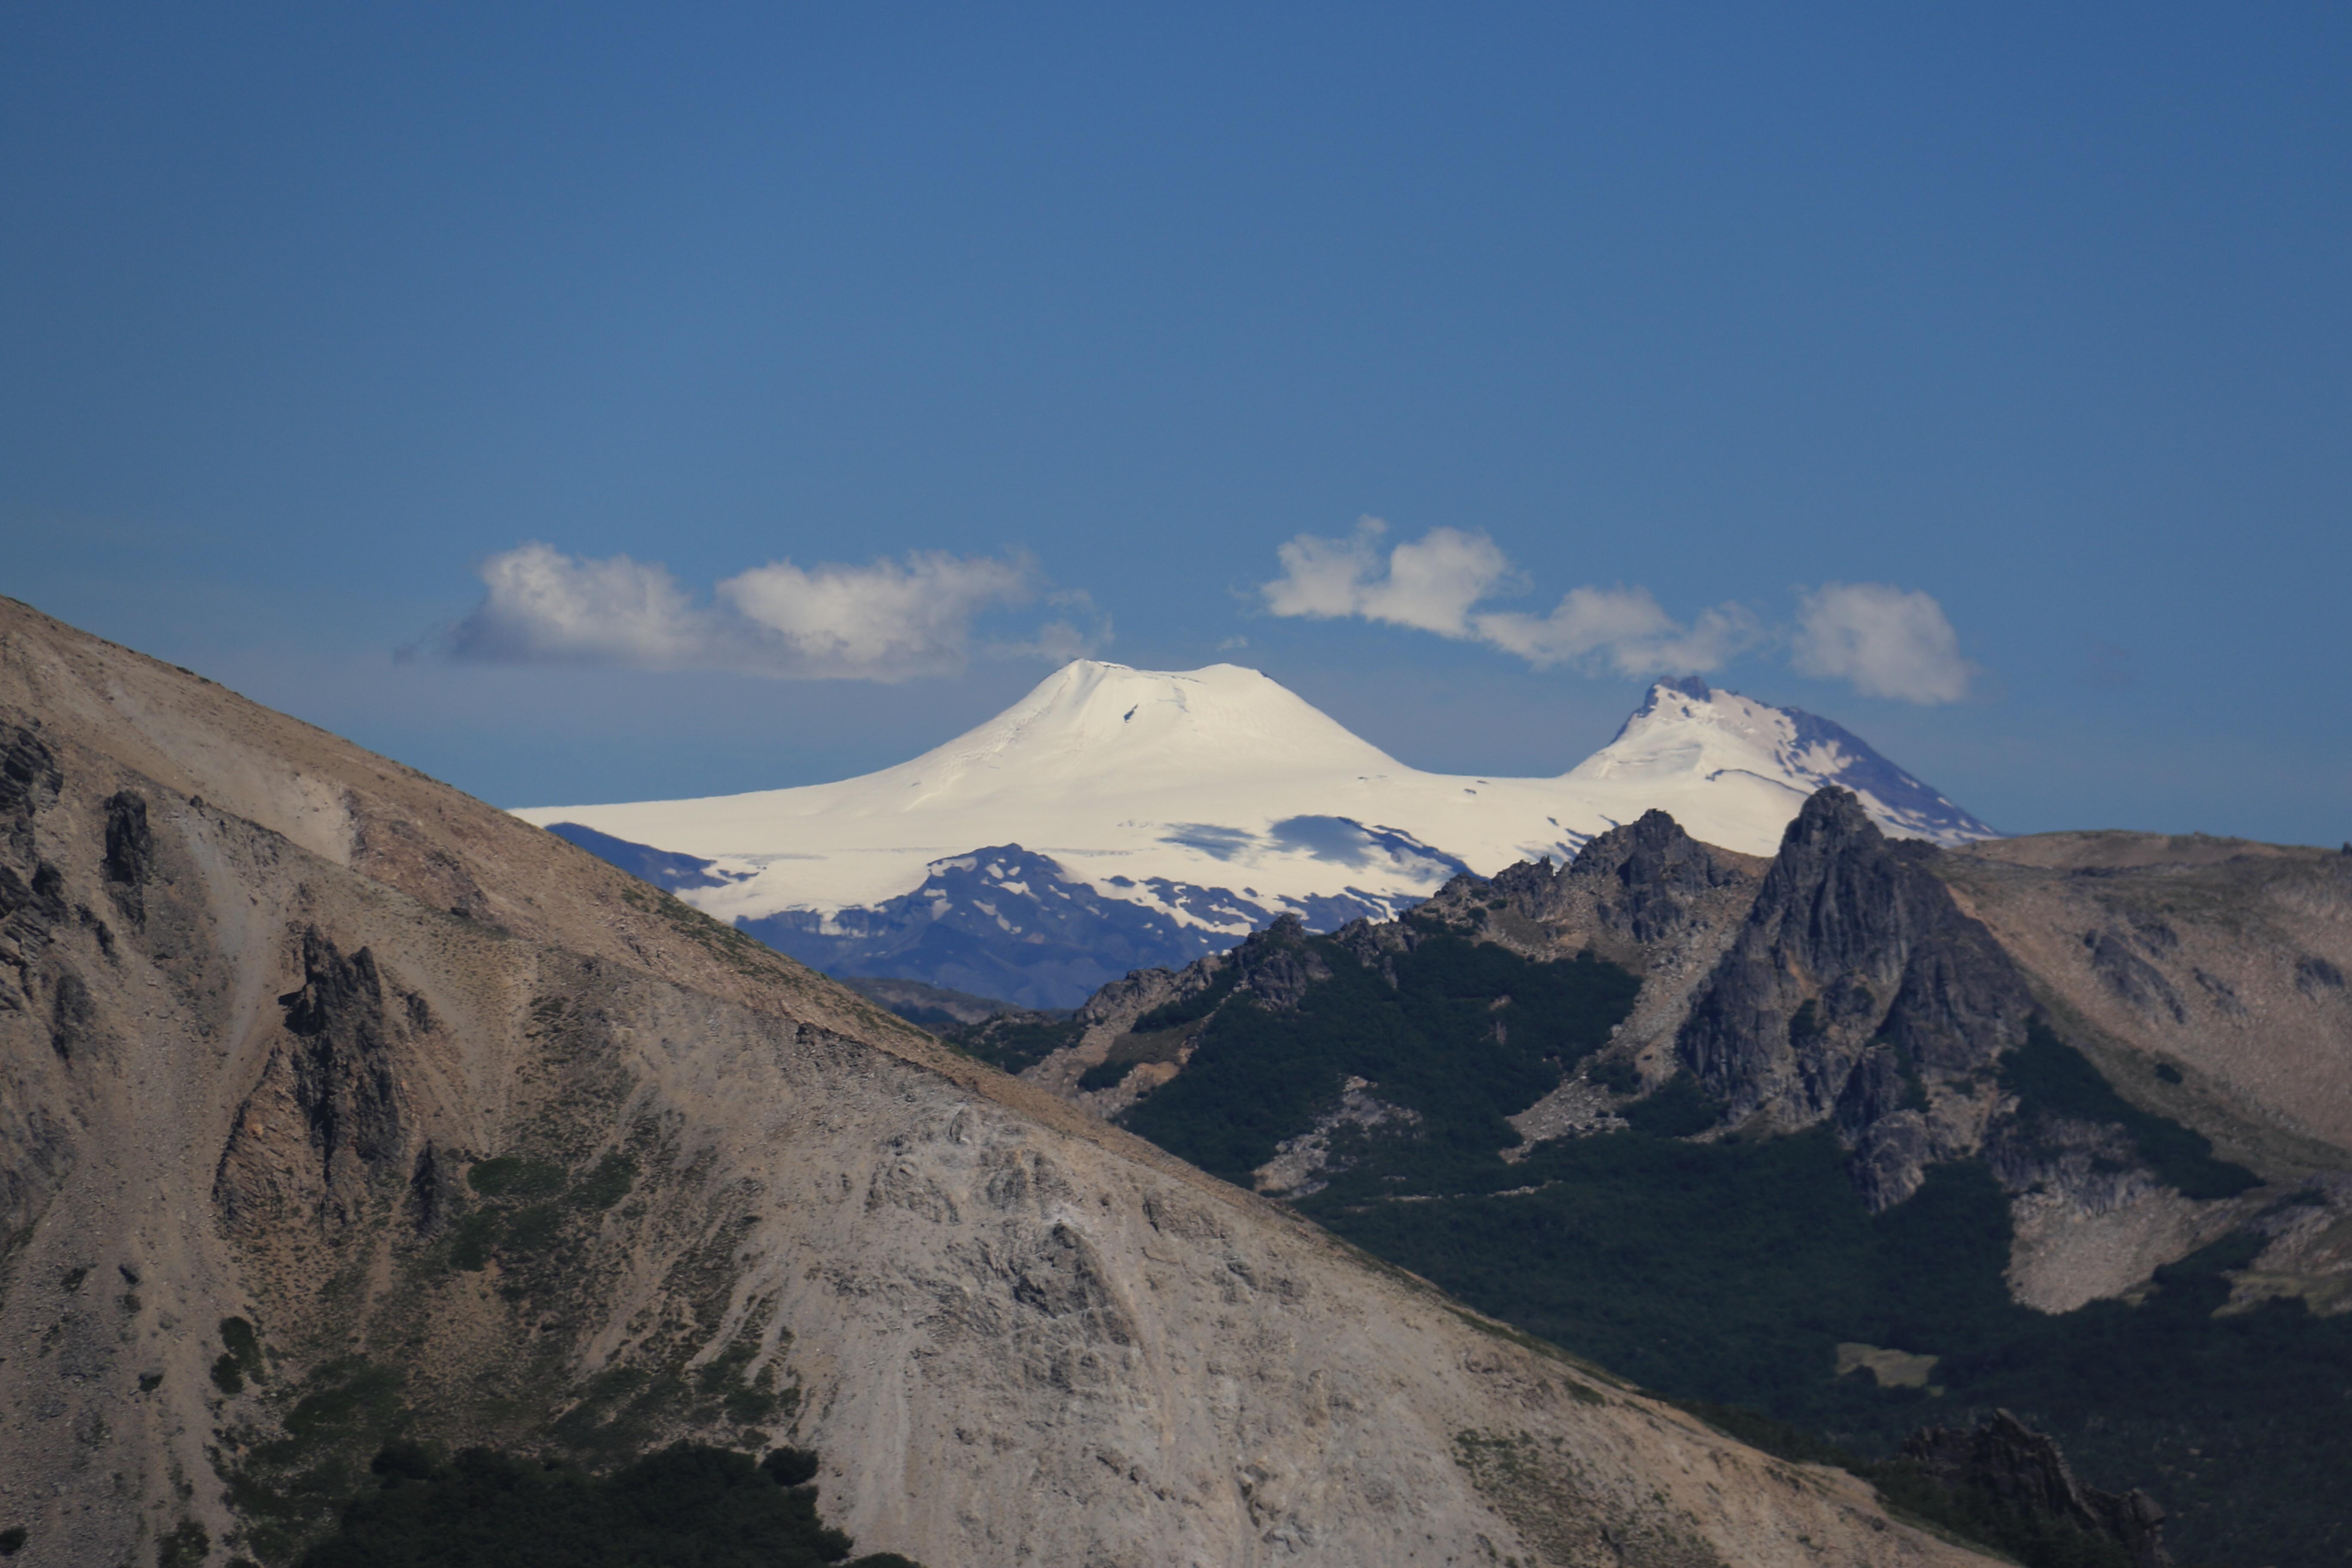 Blick zum Villarica (in Chile), vom Gipfel des Cerro Colorado